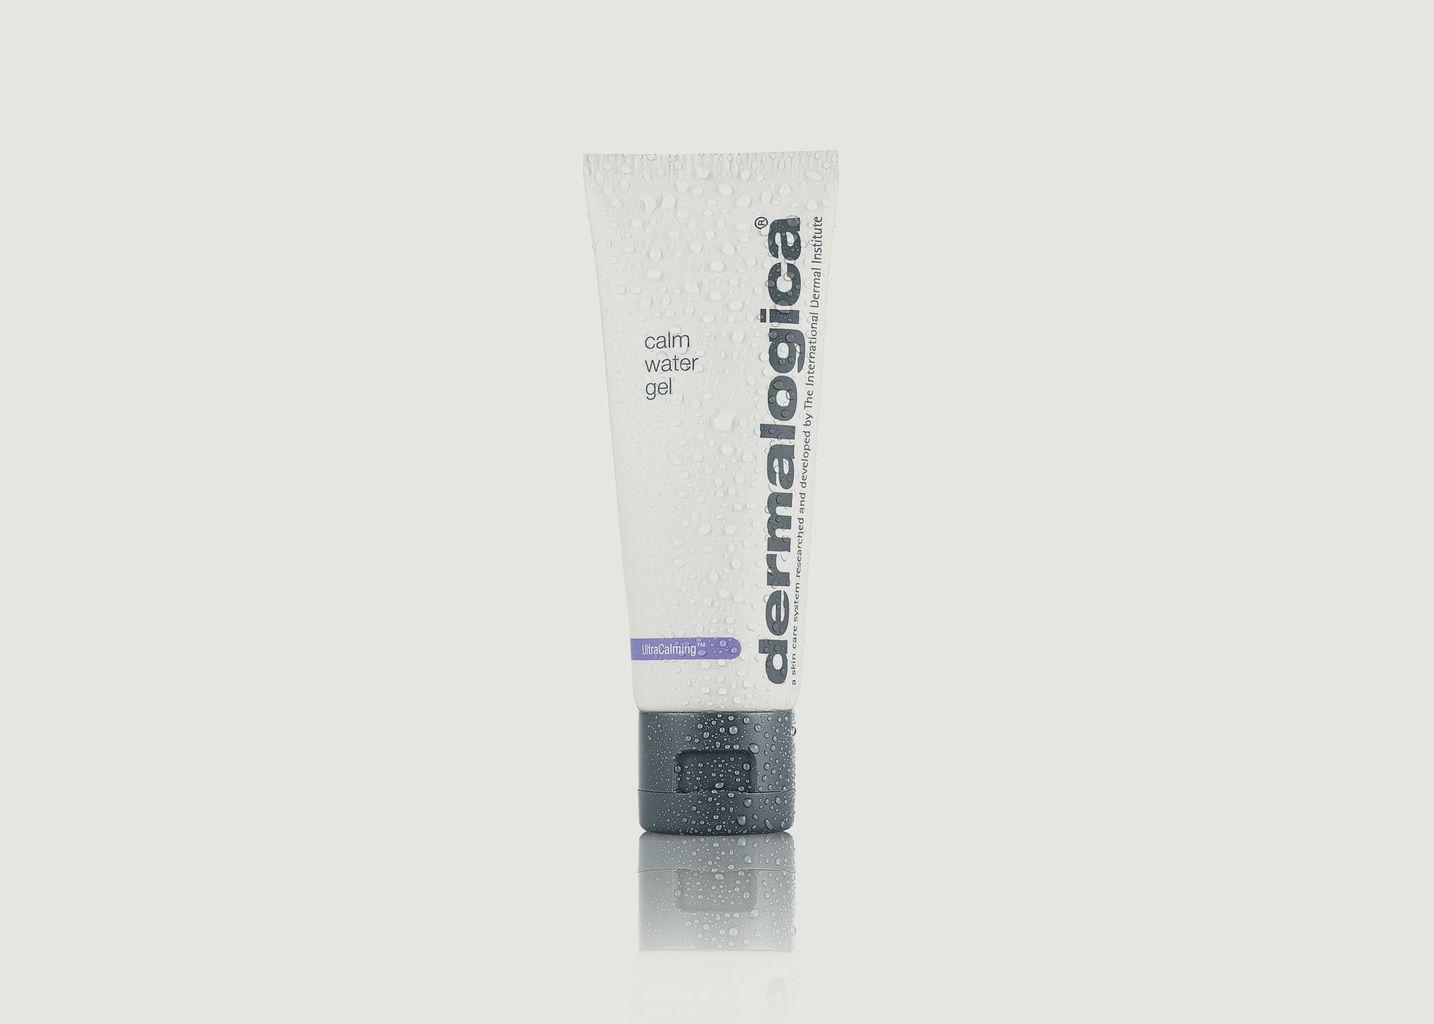 Calm water gel 50ml - Dermalogica